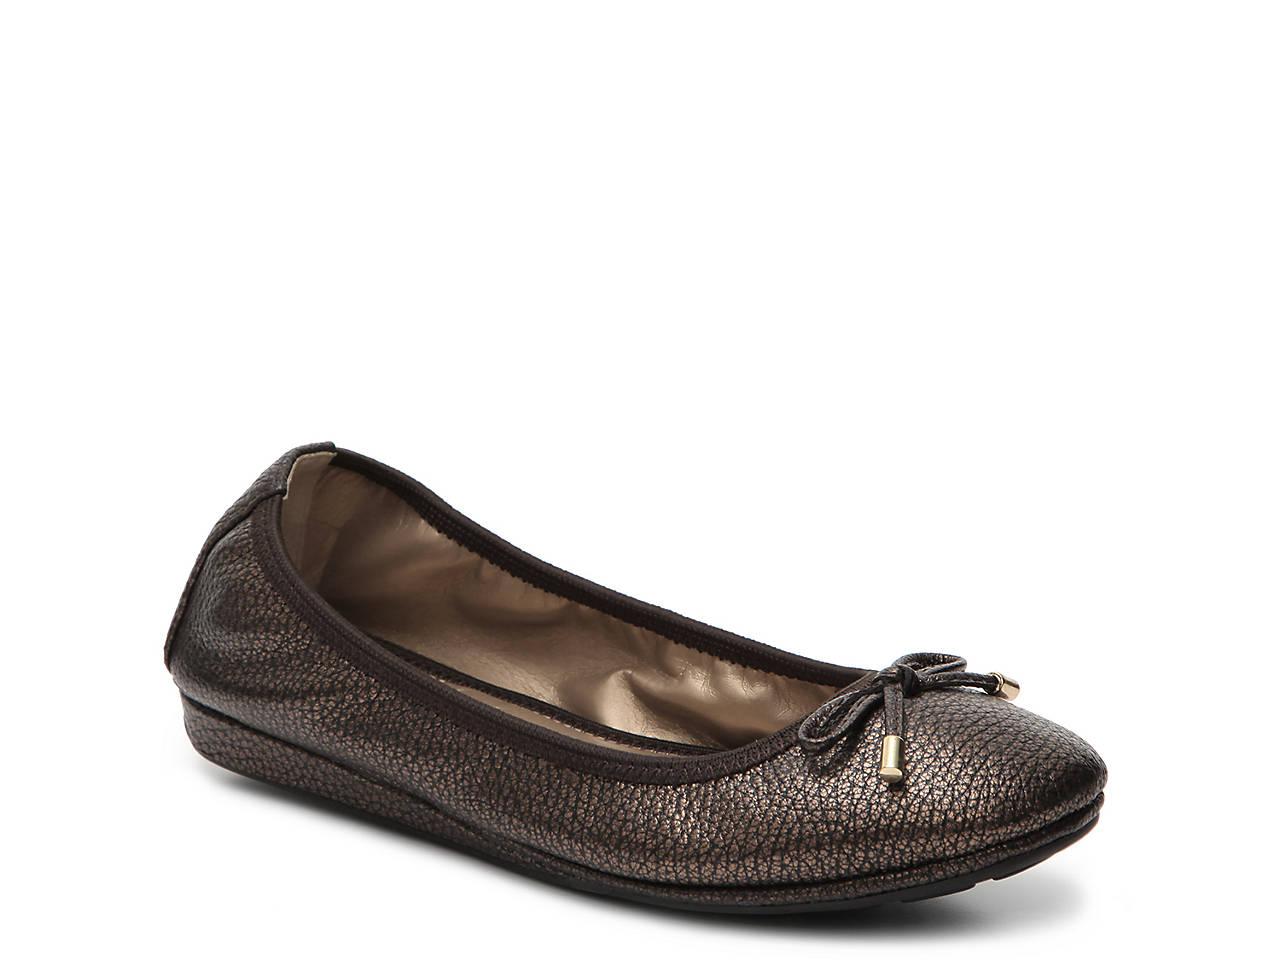 43e53d25c6 Me Too Lilo Metallic Ballet Flat Women s Shoes